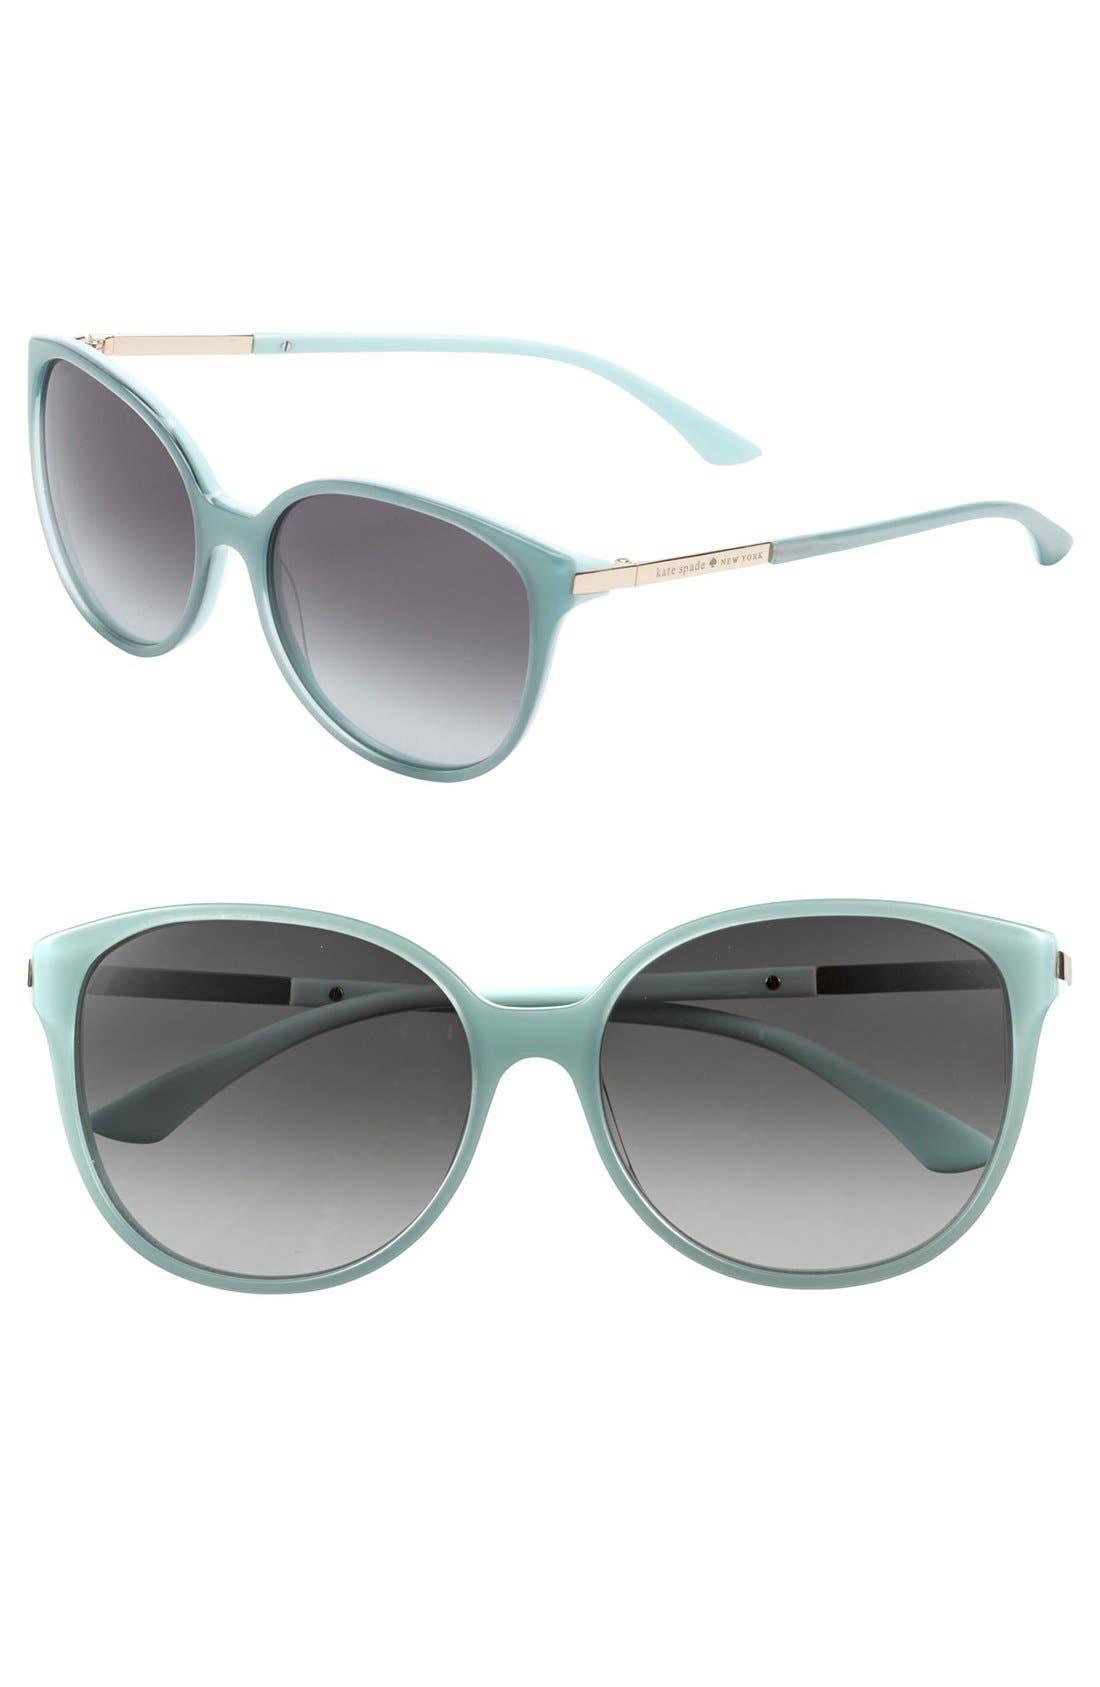 Main Image - kate spade new york 'shawna' 56mm sunglasses